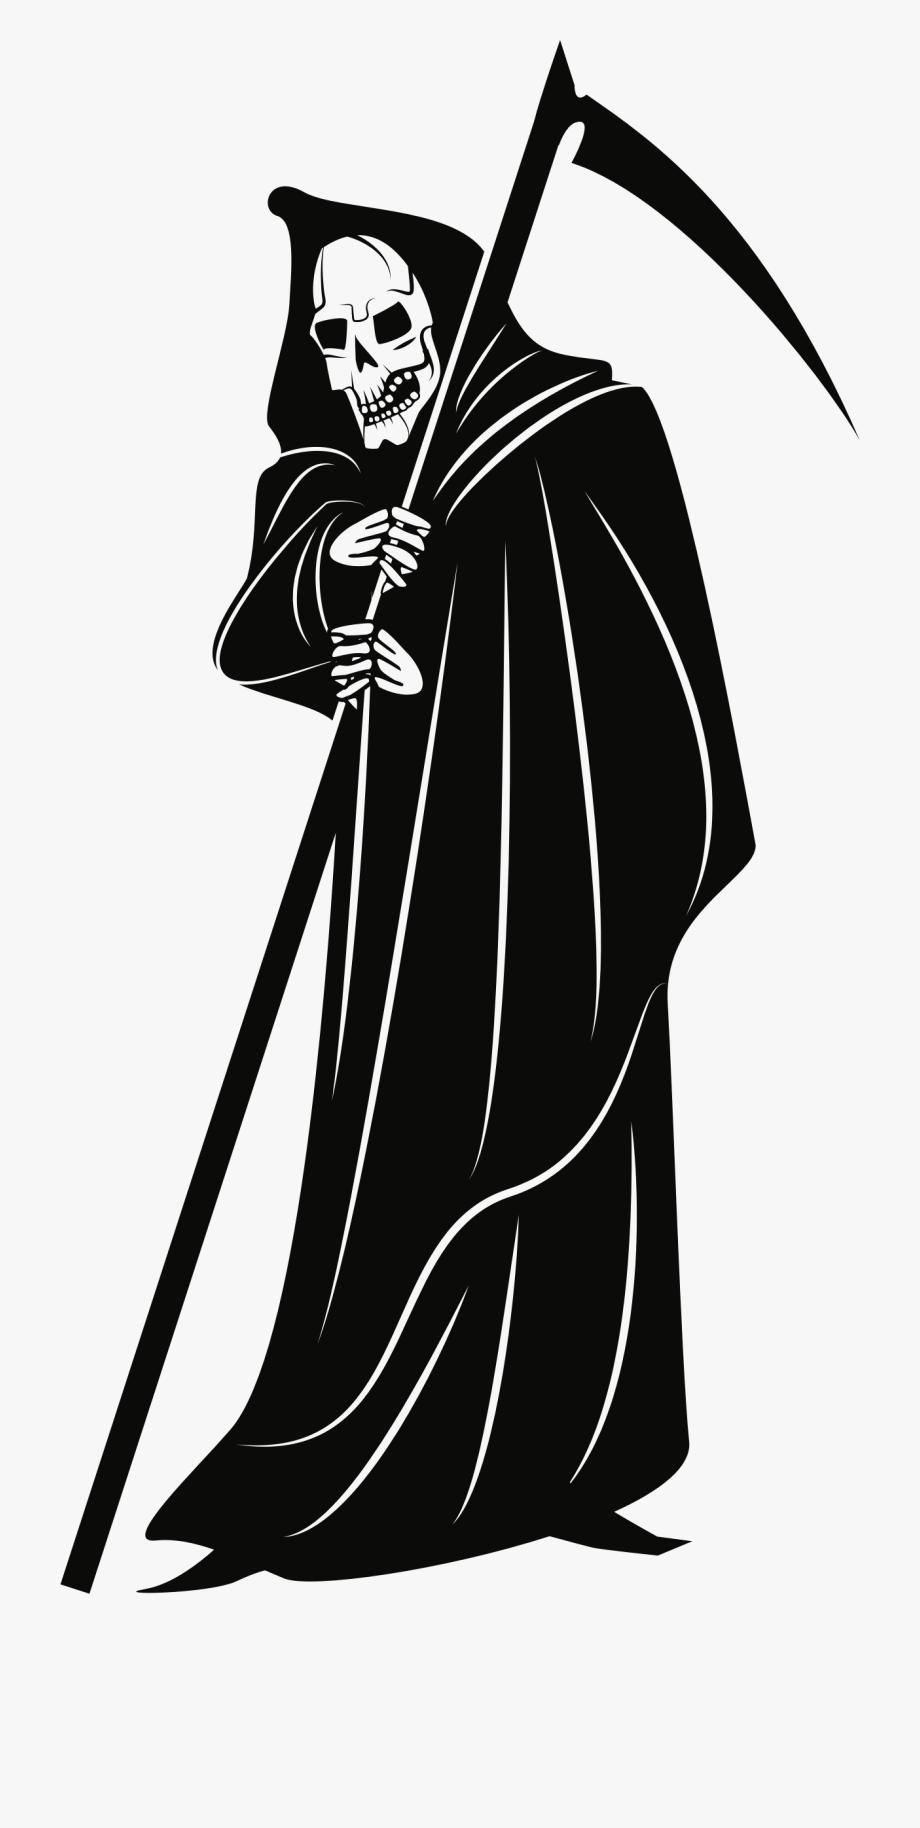 Grim Reaper Scythe Png.